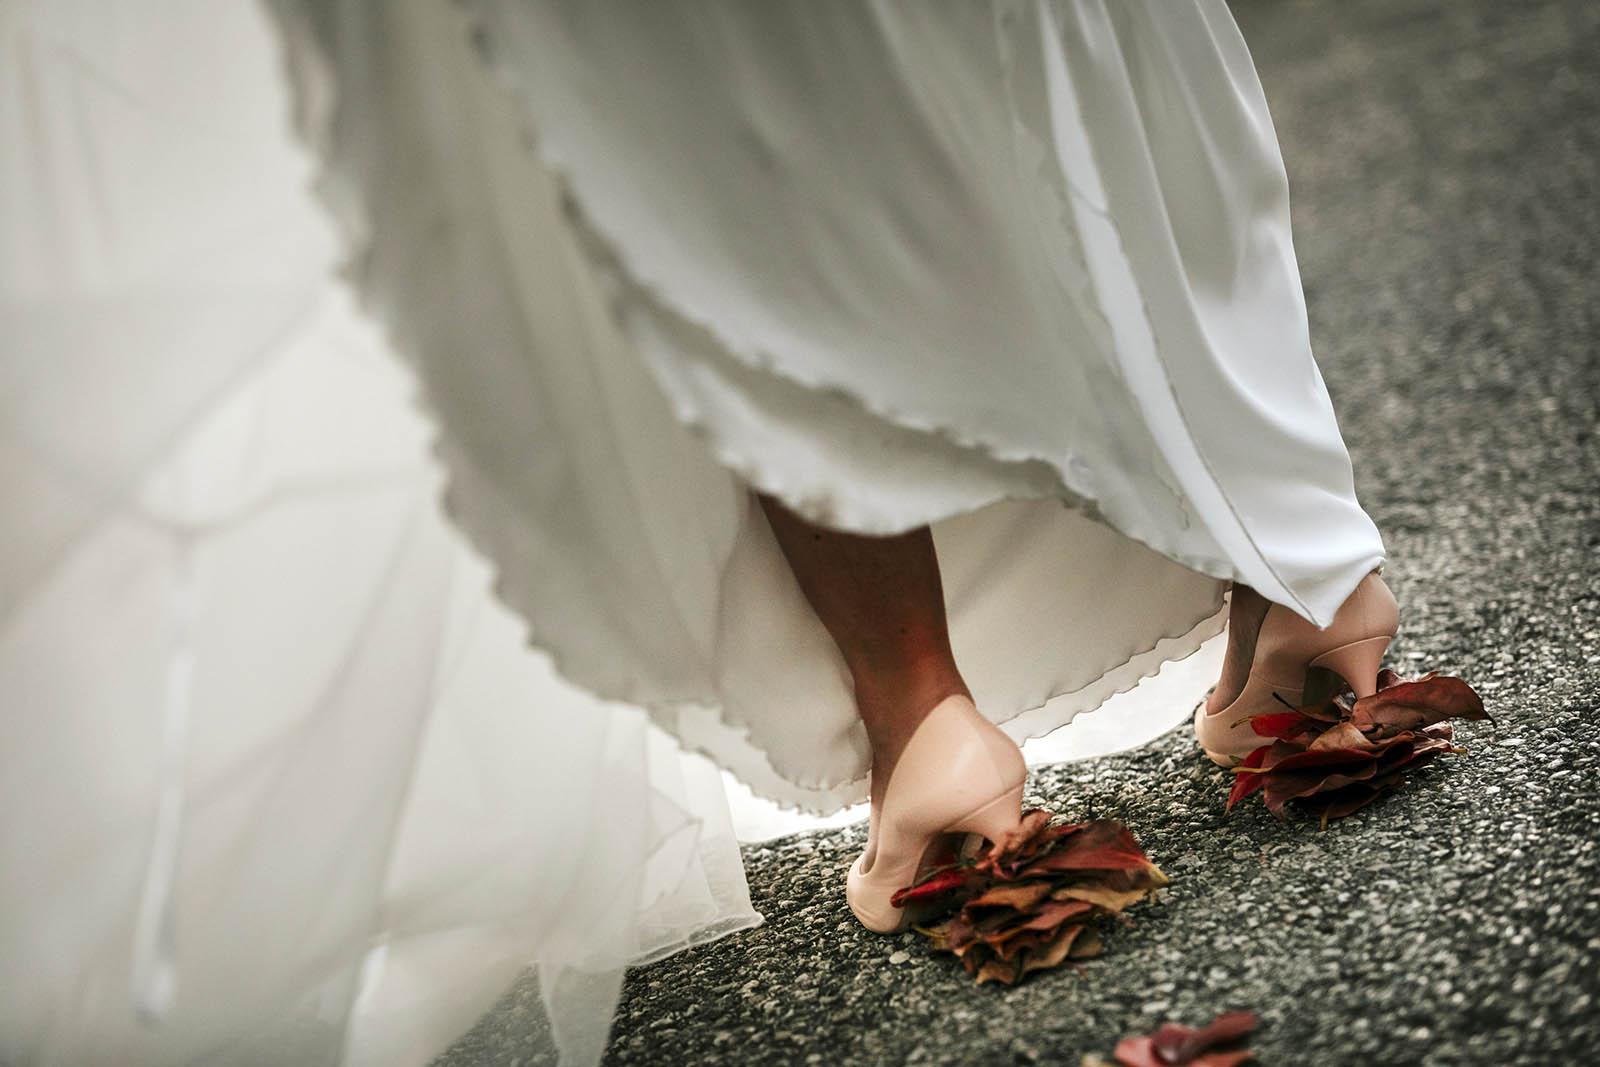 ELISA & LUCA | Il matrimonio in Ottobre, una scelta indovinata.